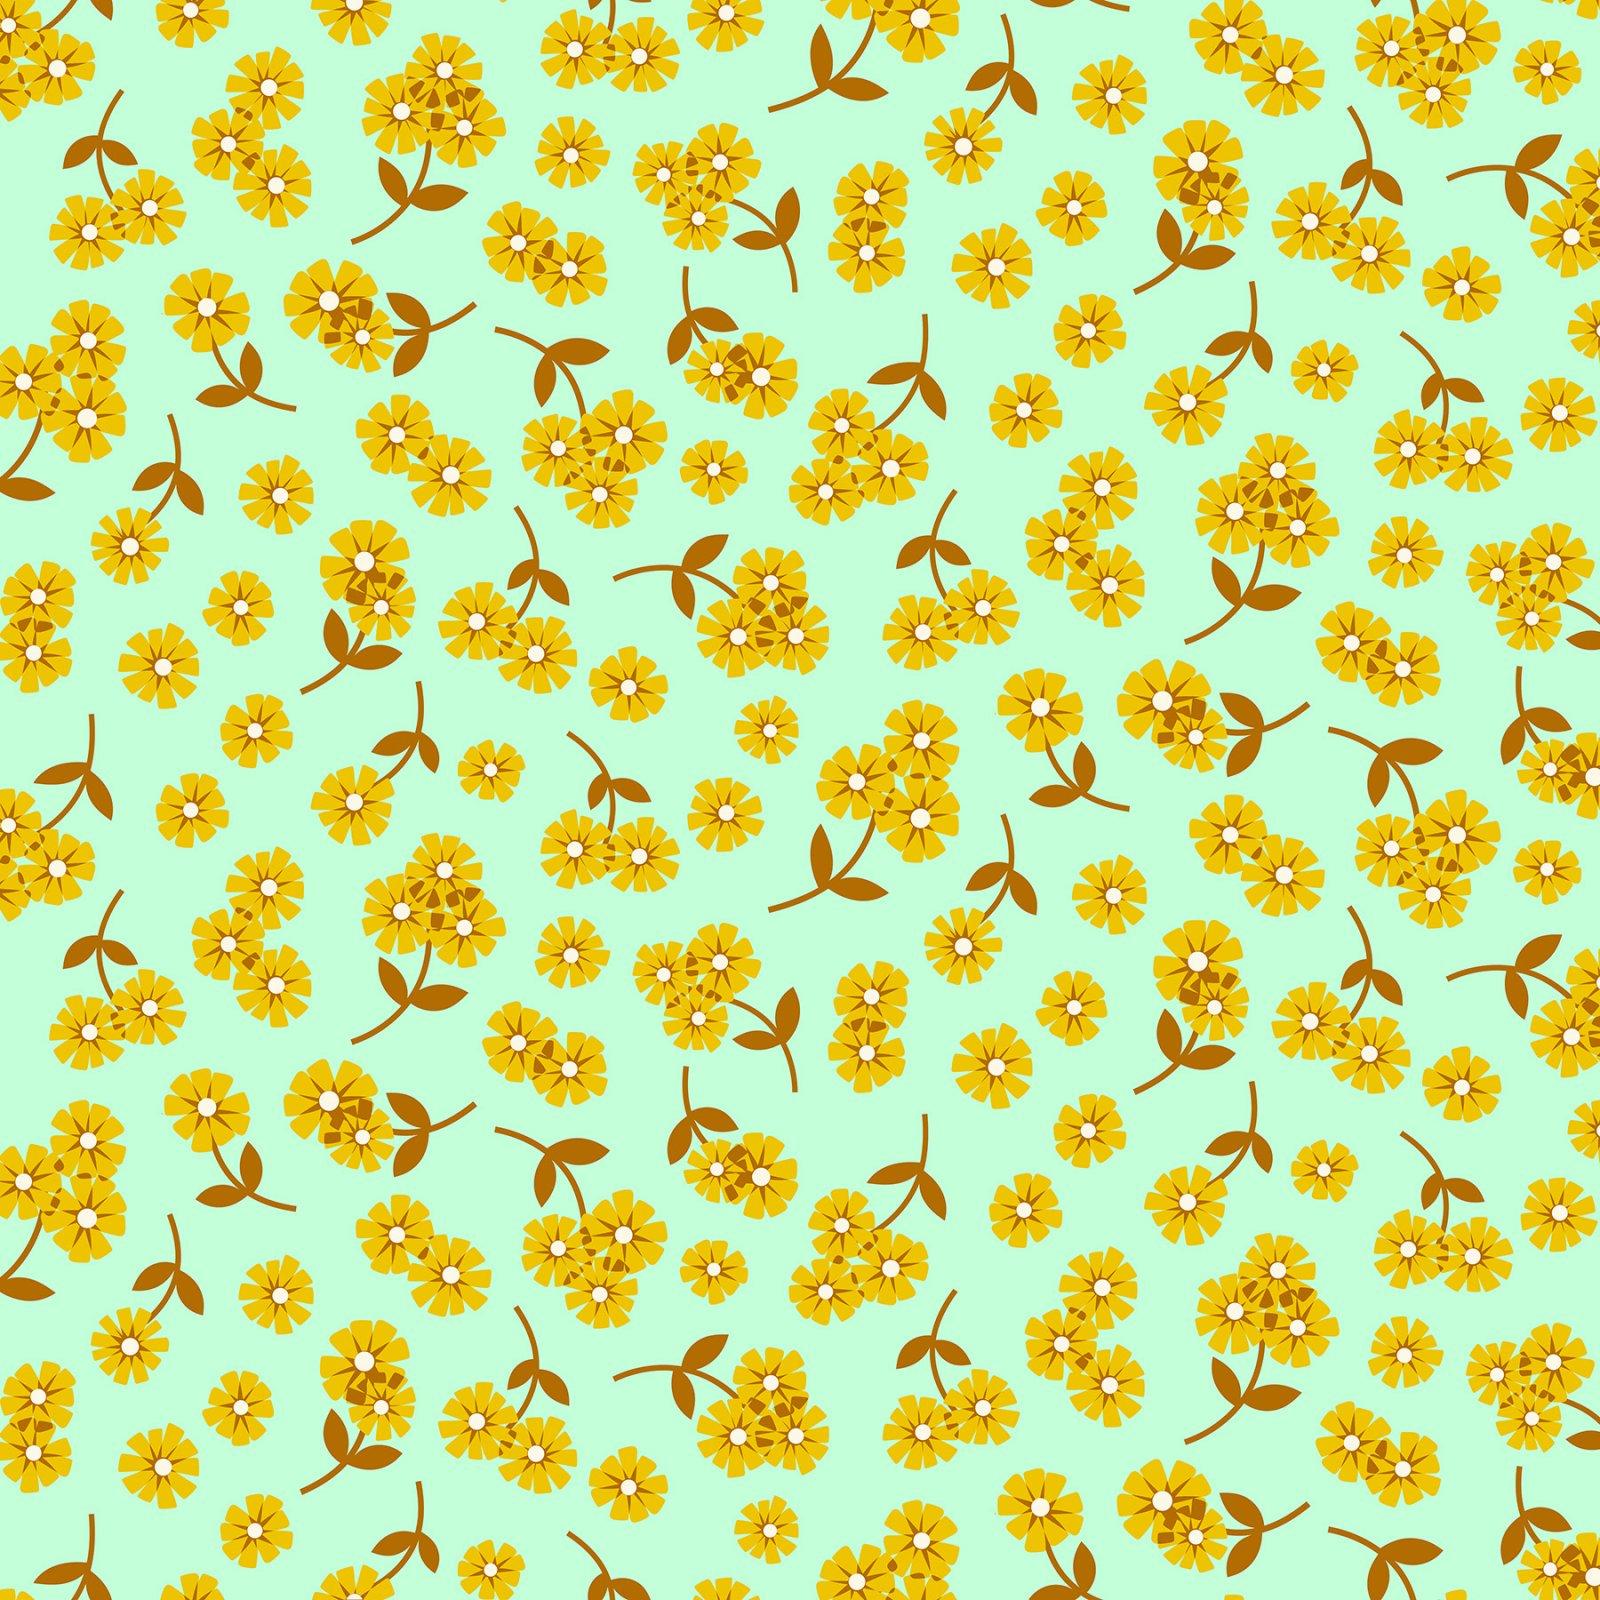 Daisies/Mint: Butterscotch (Figo)